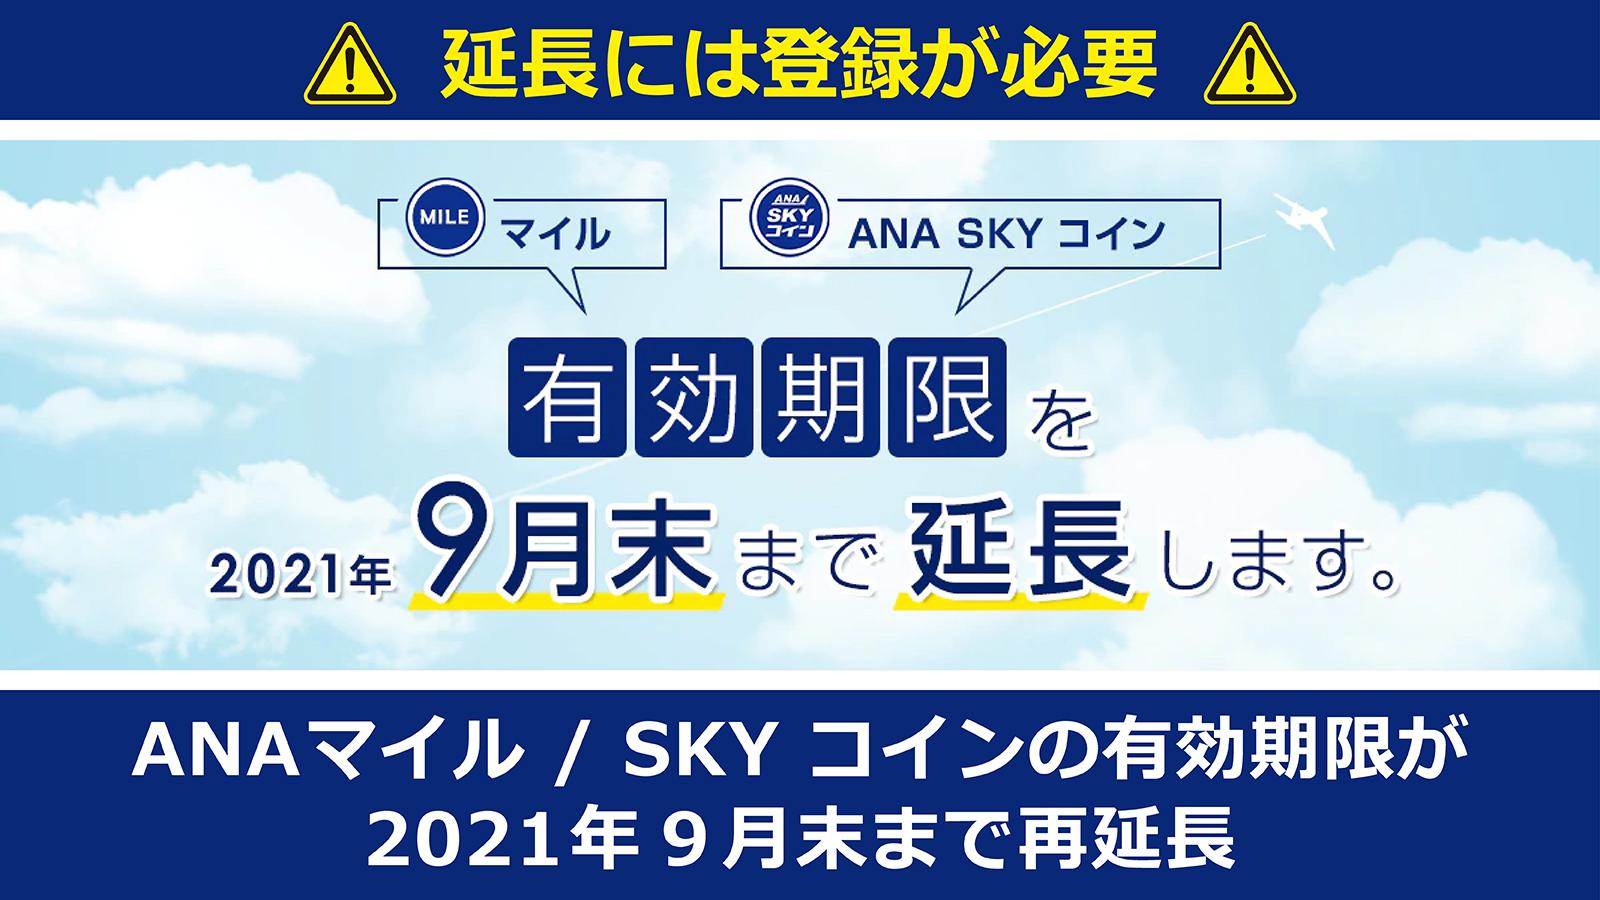 ANAマイル / SKY コインの有効期限が2021年9月末まで再延長 – 延長には登録が必要